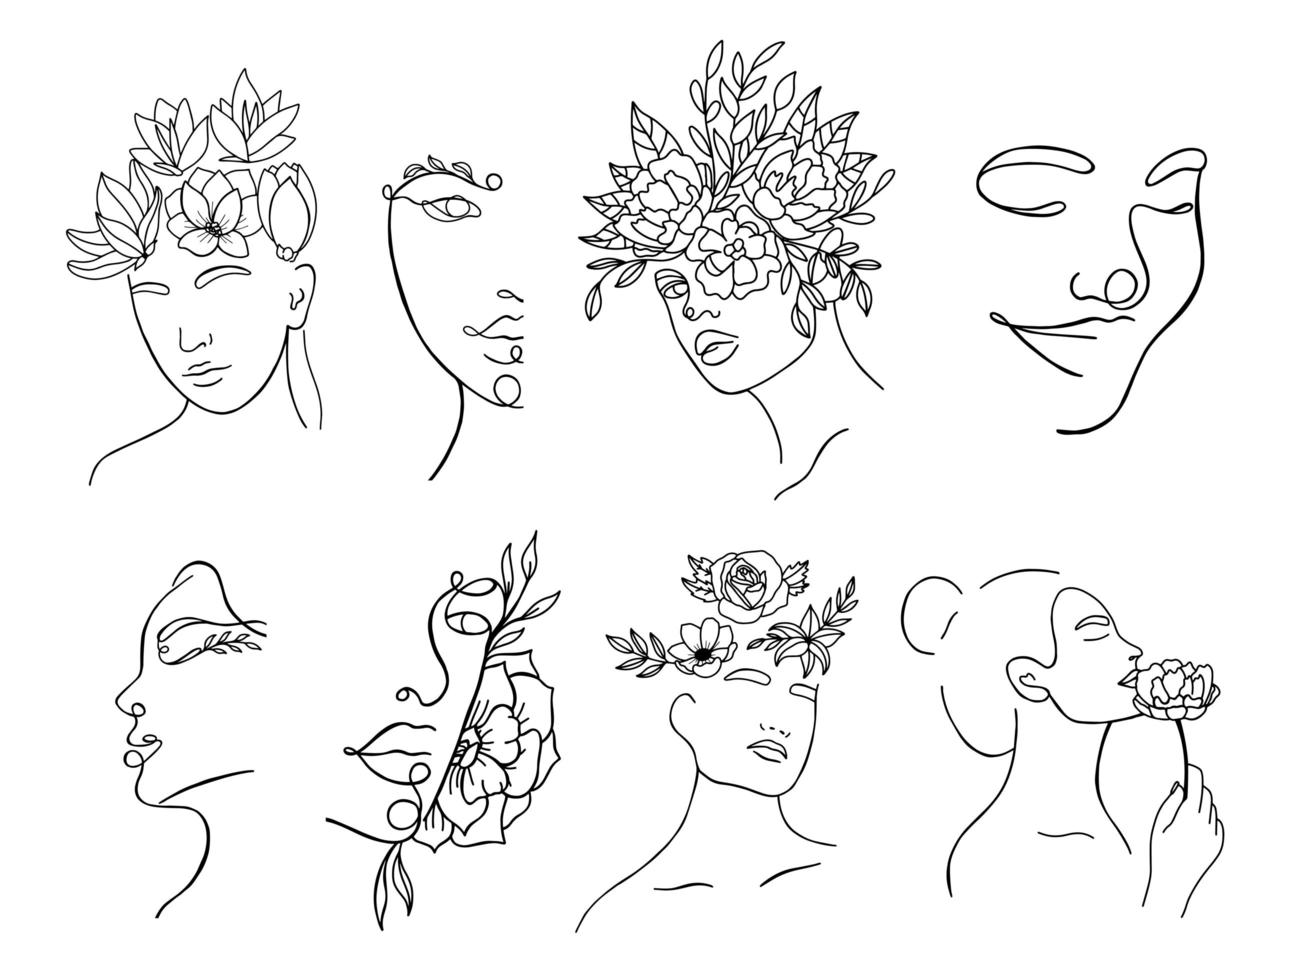 silueta lineal continua de rostros femeninos vector